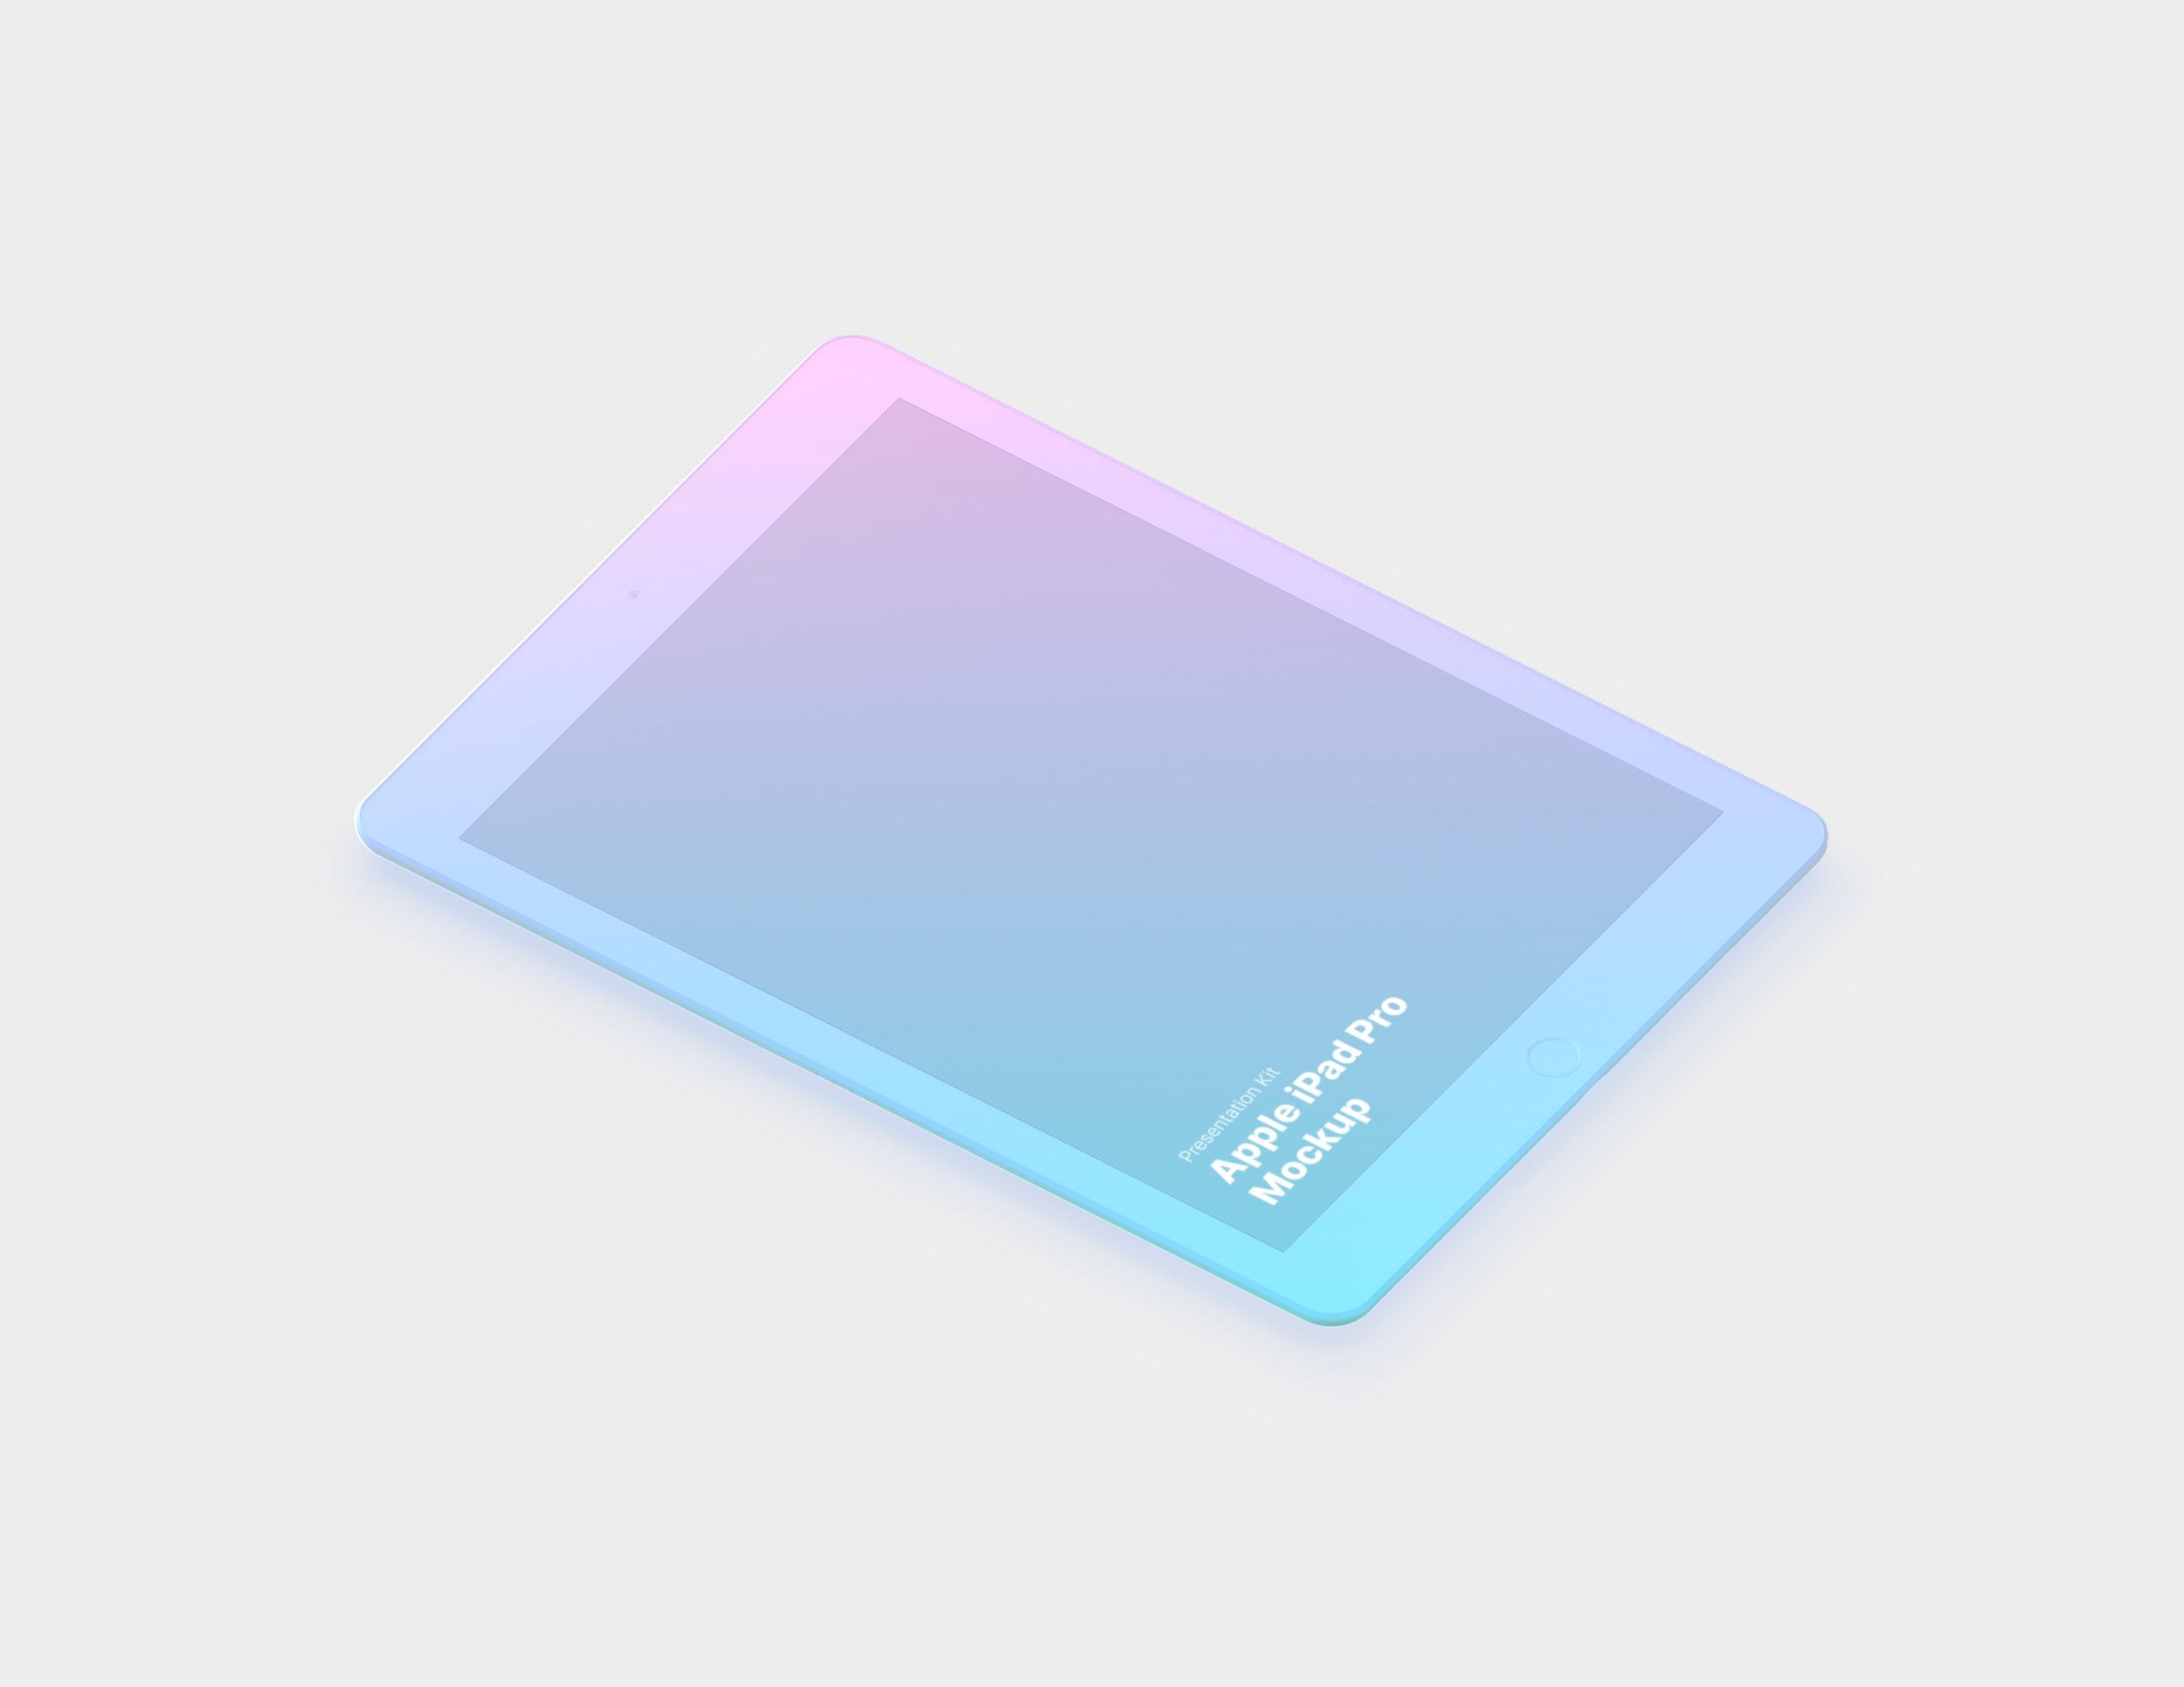 iPad Pro Mockup for Sketch, Photoshop, Figma